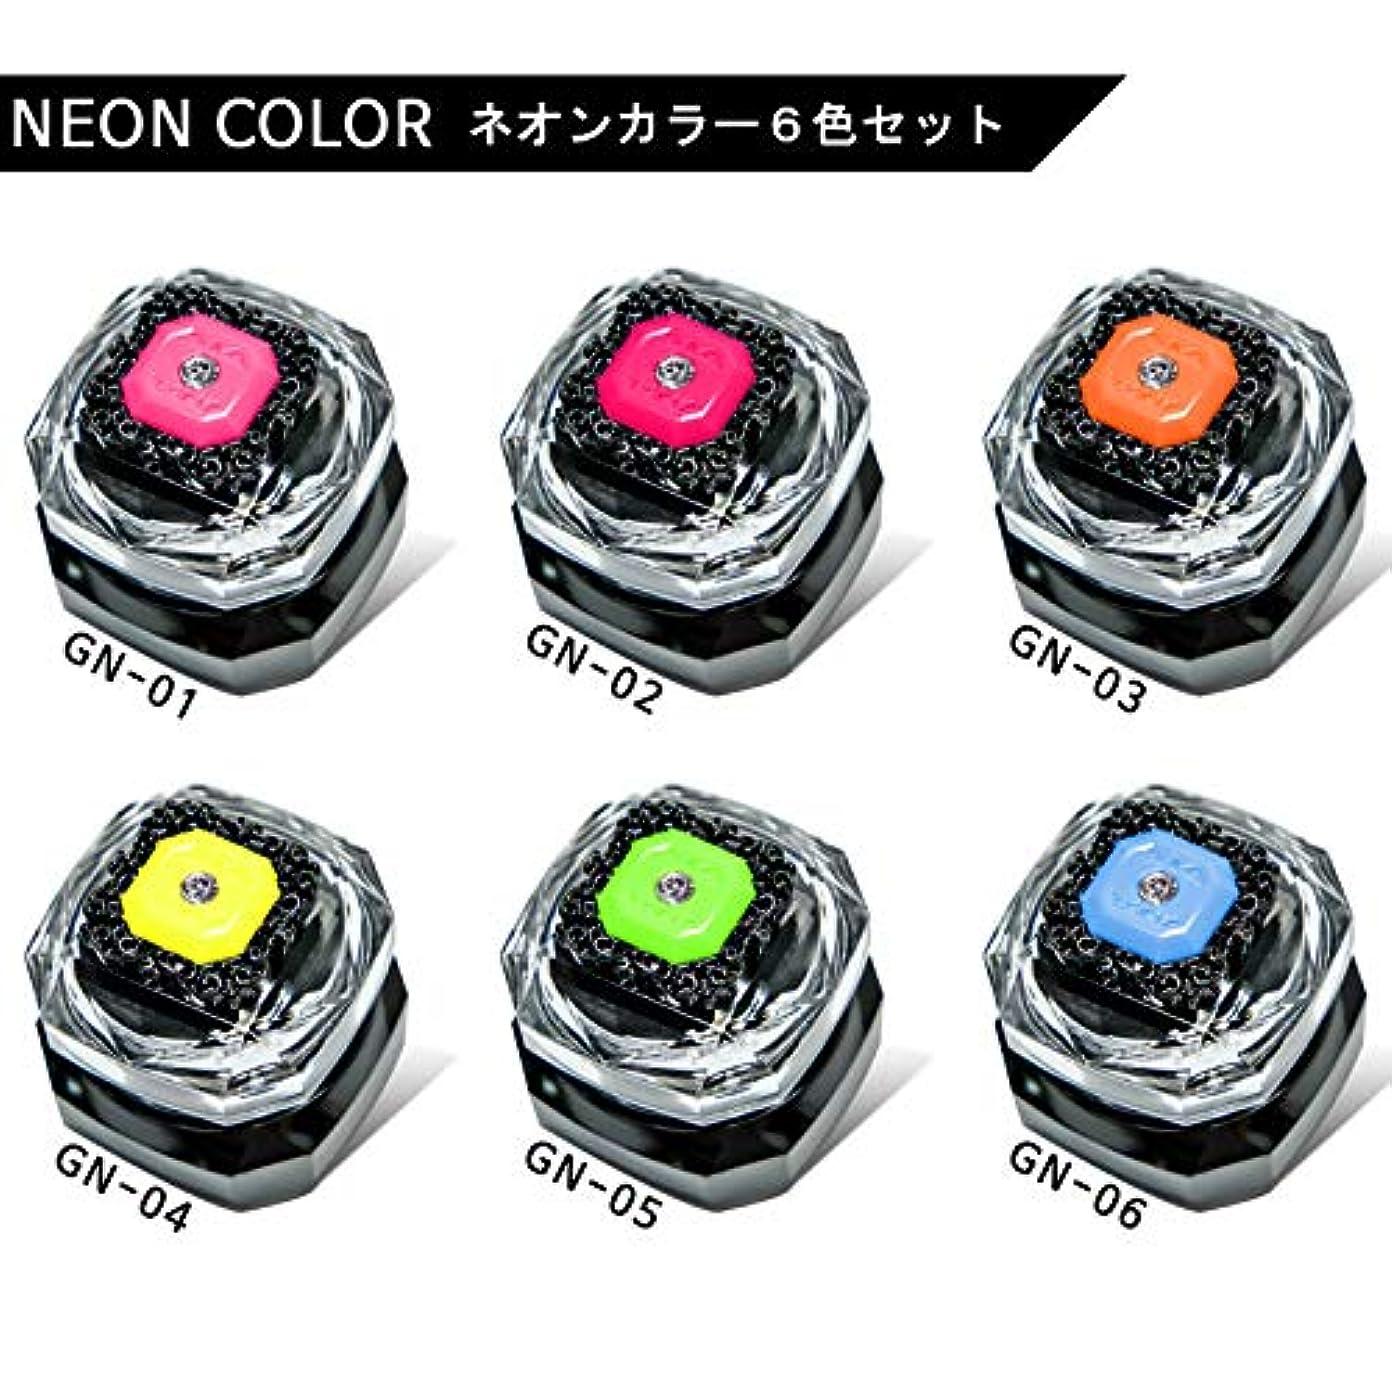 KENZICO (ケンジコ) 夜光ジェル ネオンカラー お得な 6色SET